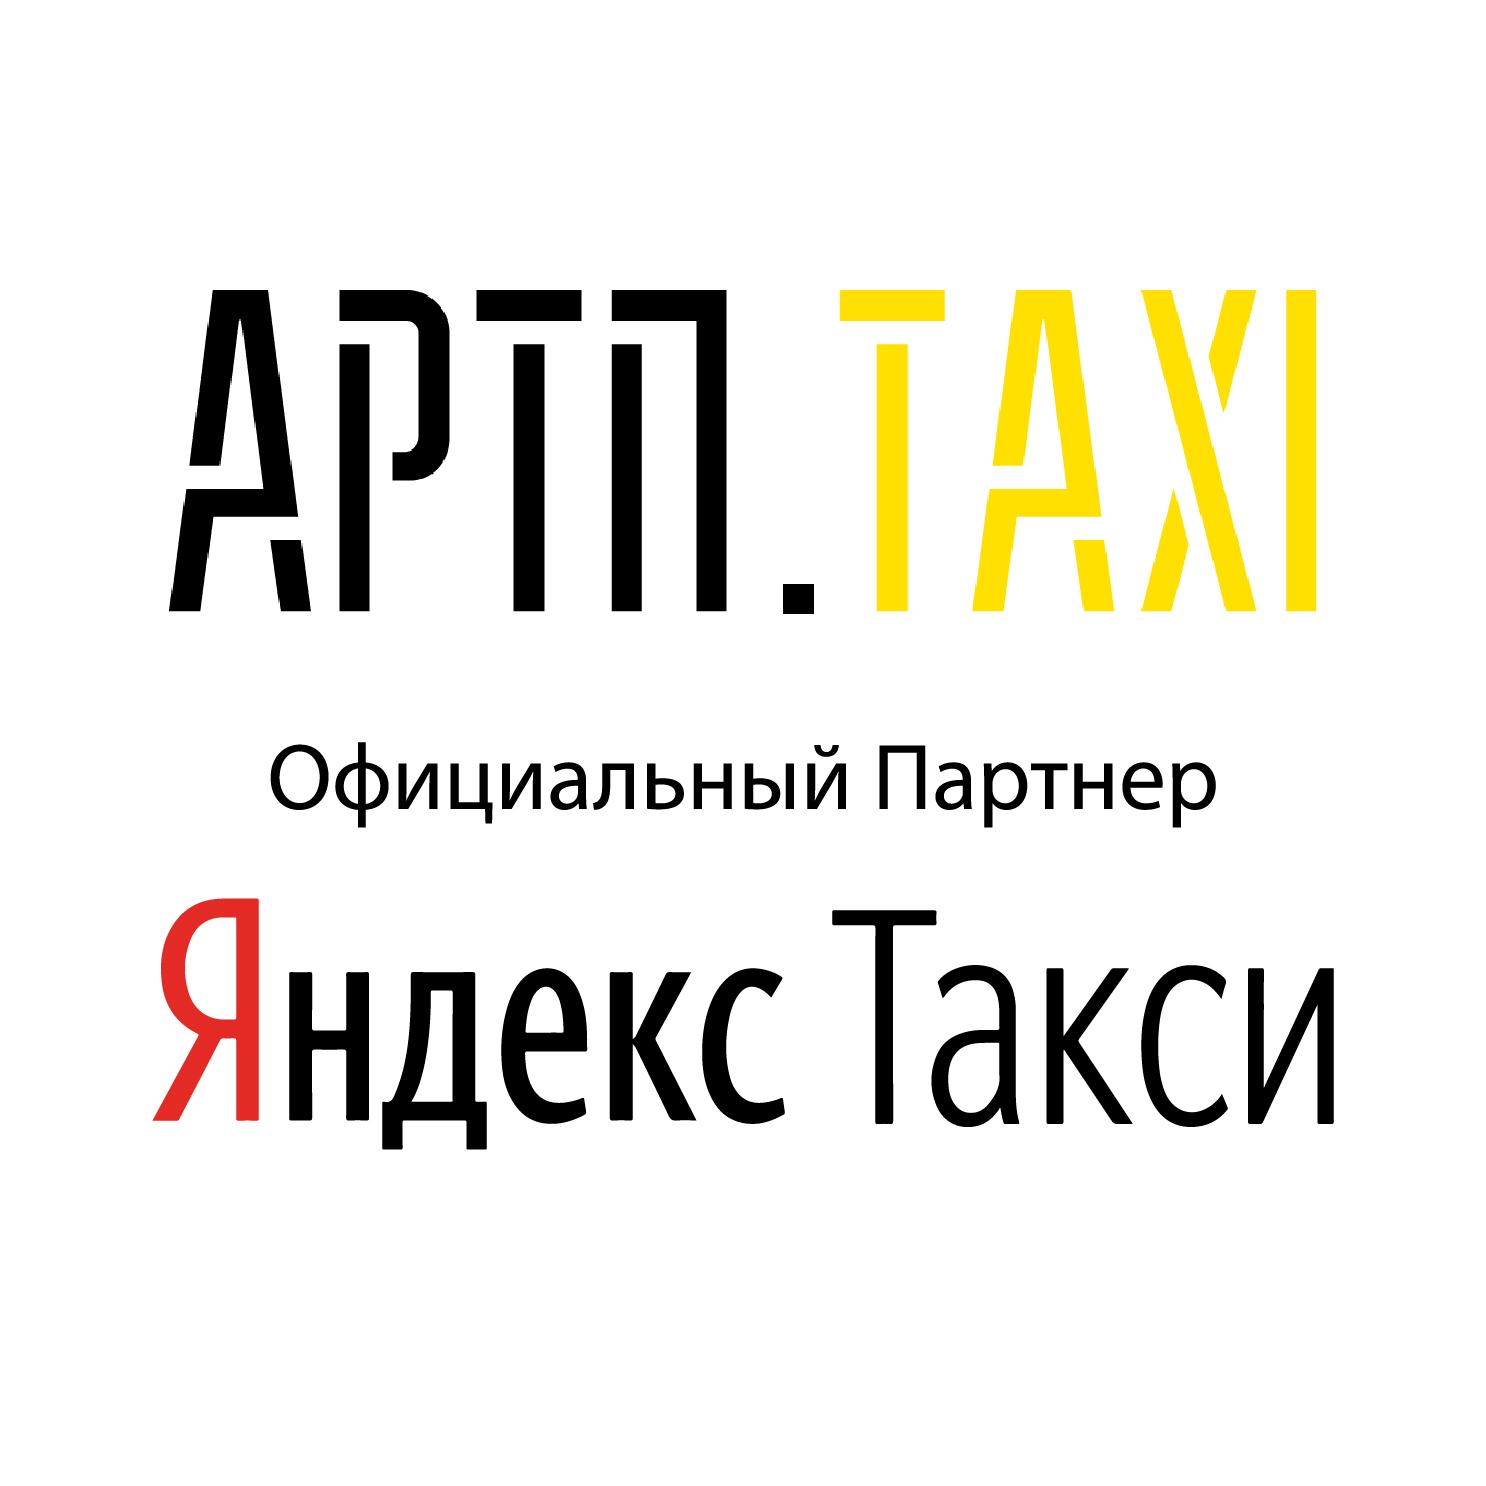 Работа в компании «АРТП такси» в Приозерска